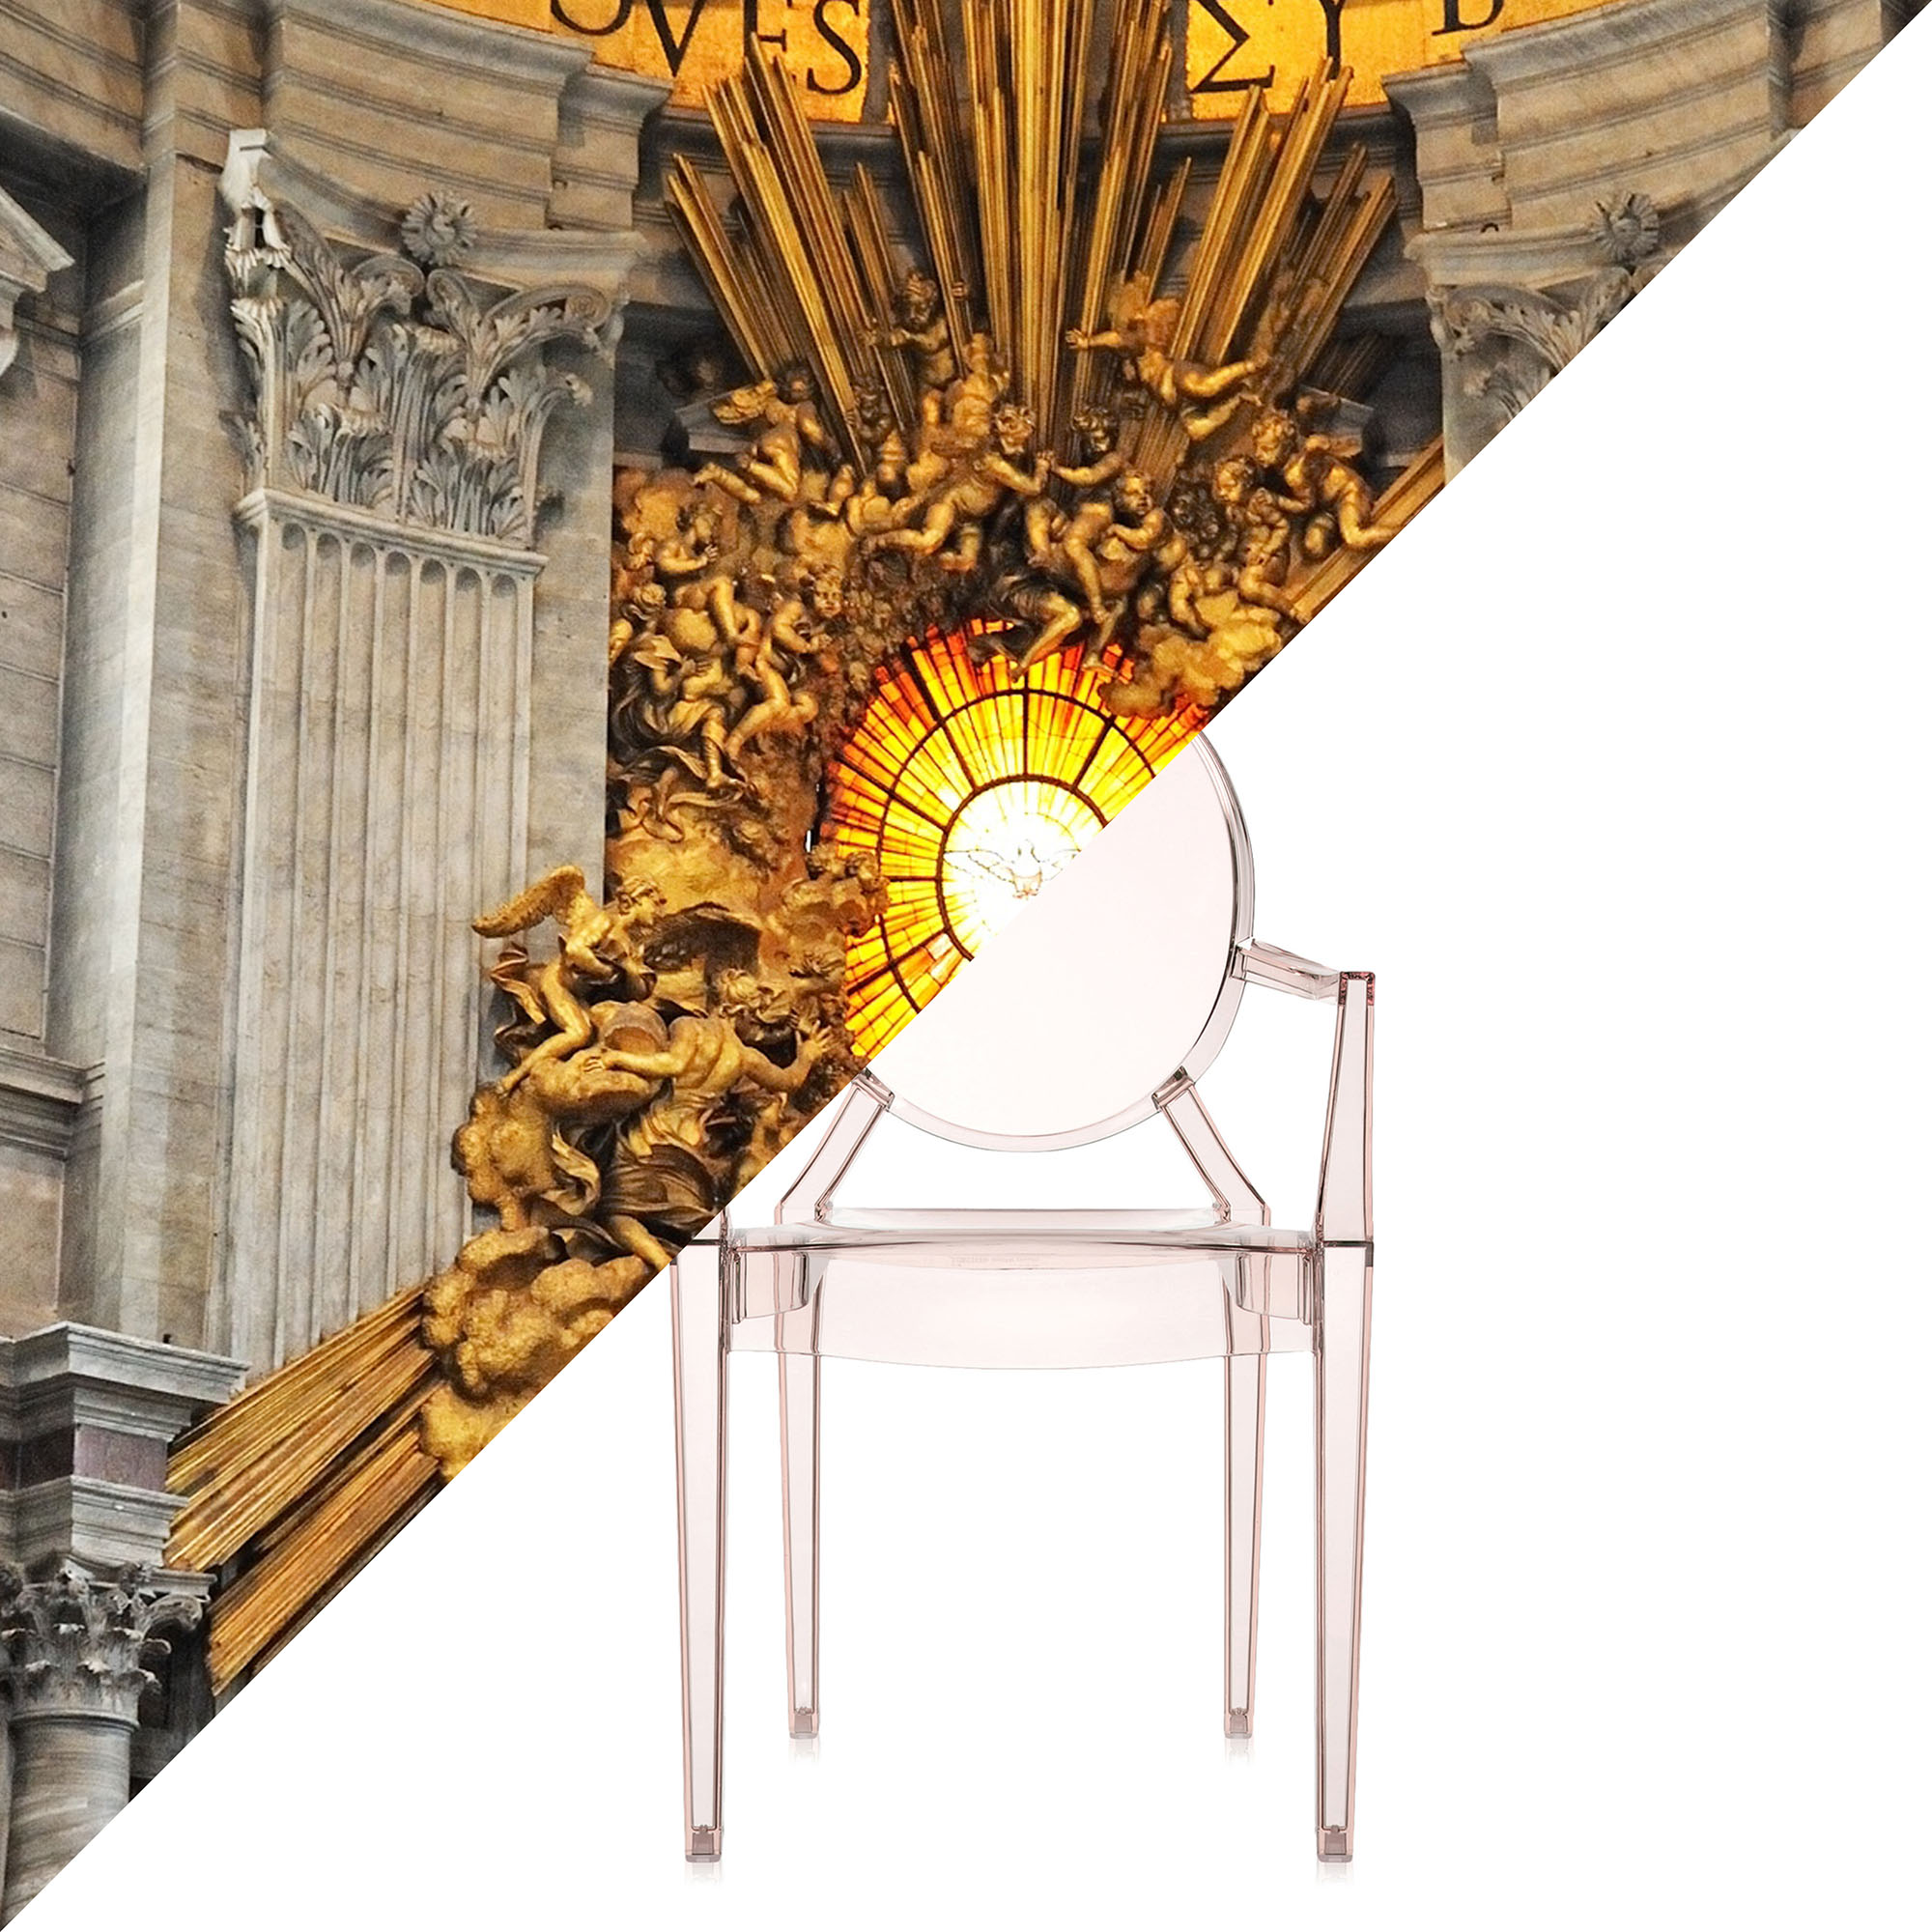 CONFÓRMI Kartell, Gian Lorenzo Bernini, Throne of Saint Peter, St. Peter's Basilica | Vatican City, 1647-1653 VS Philippe Starck, Louis Ghost